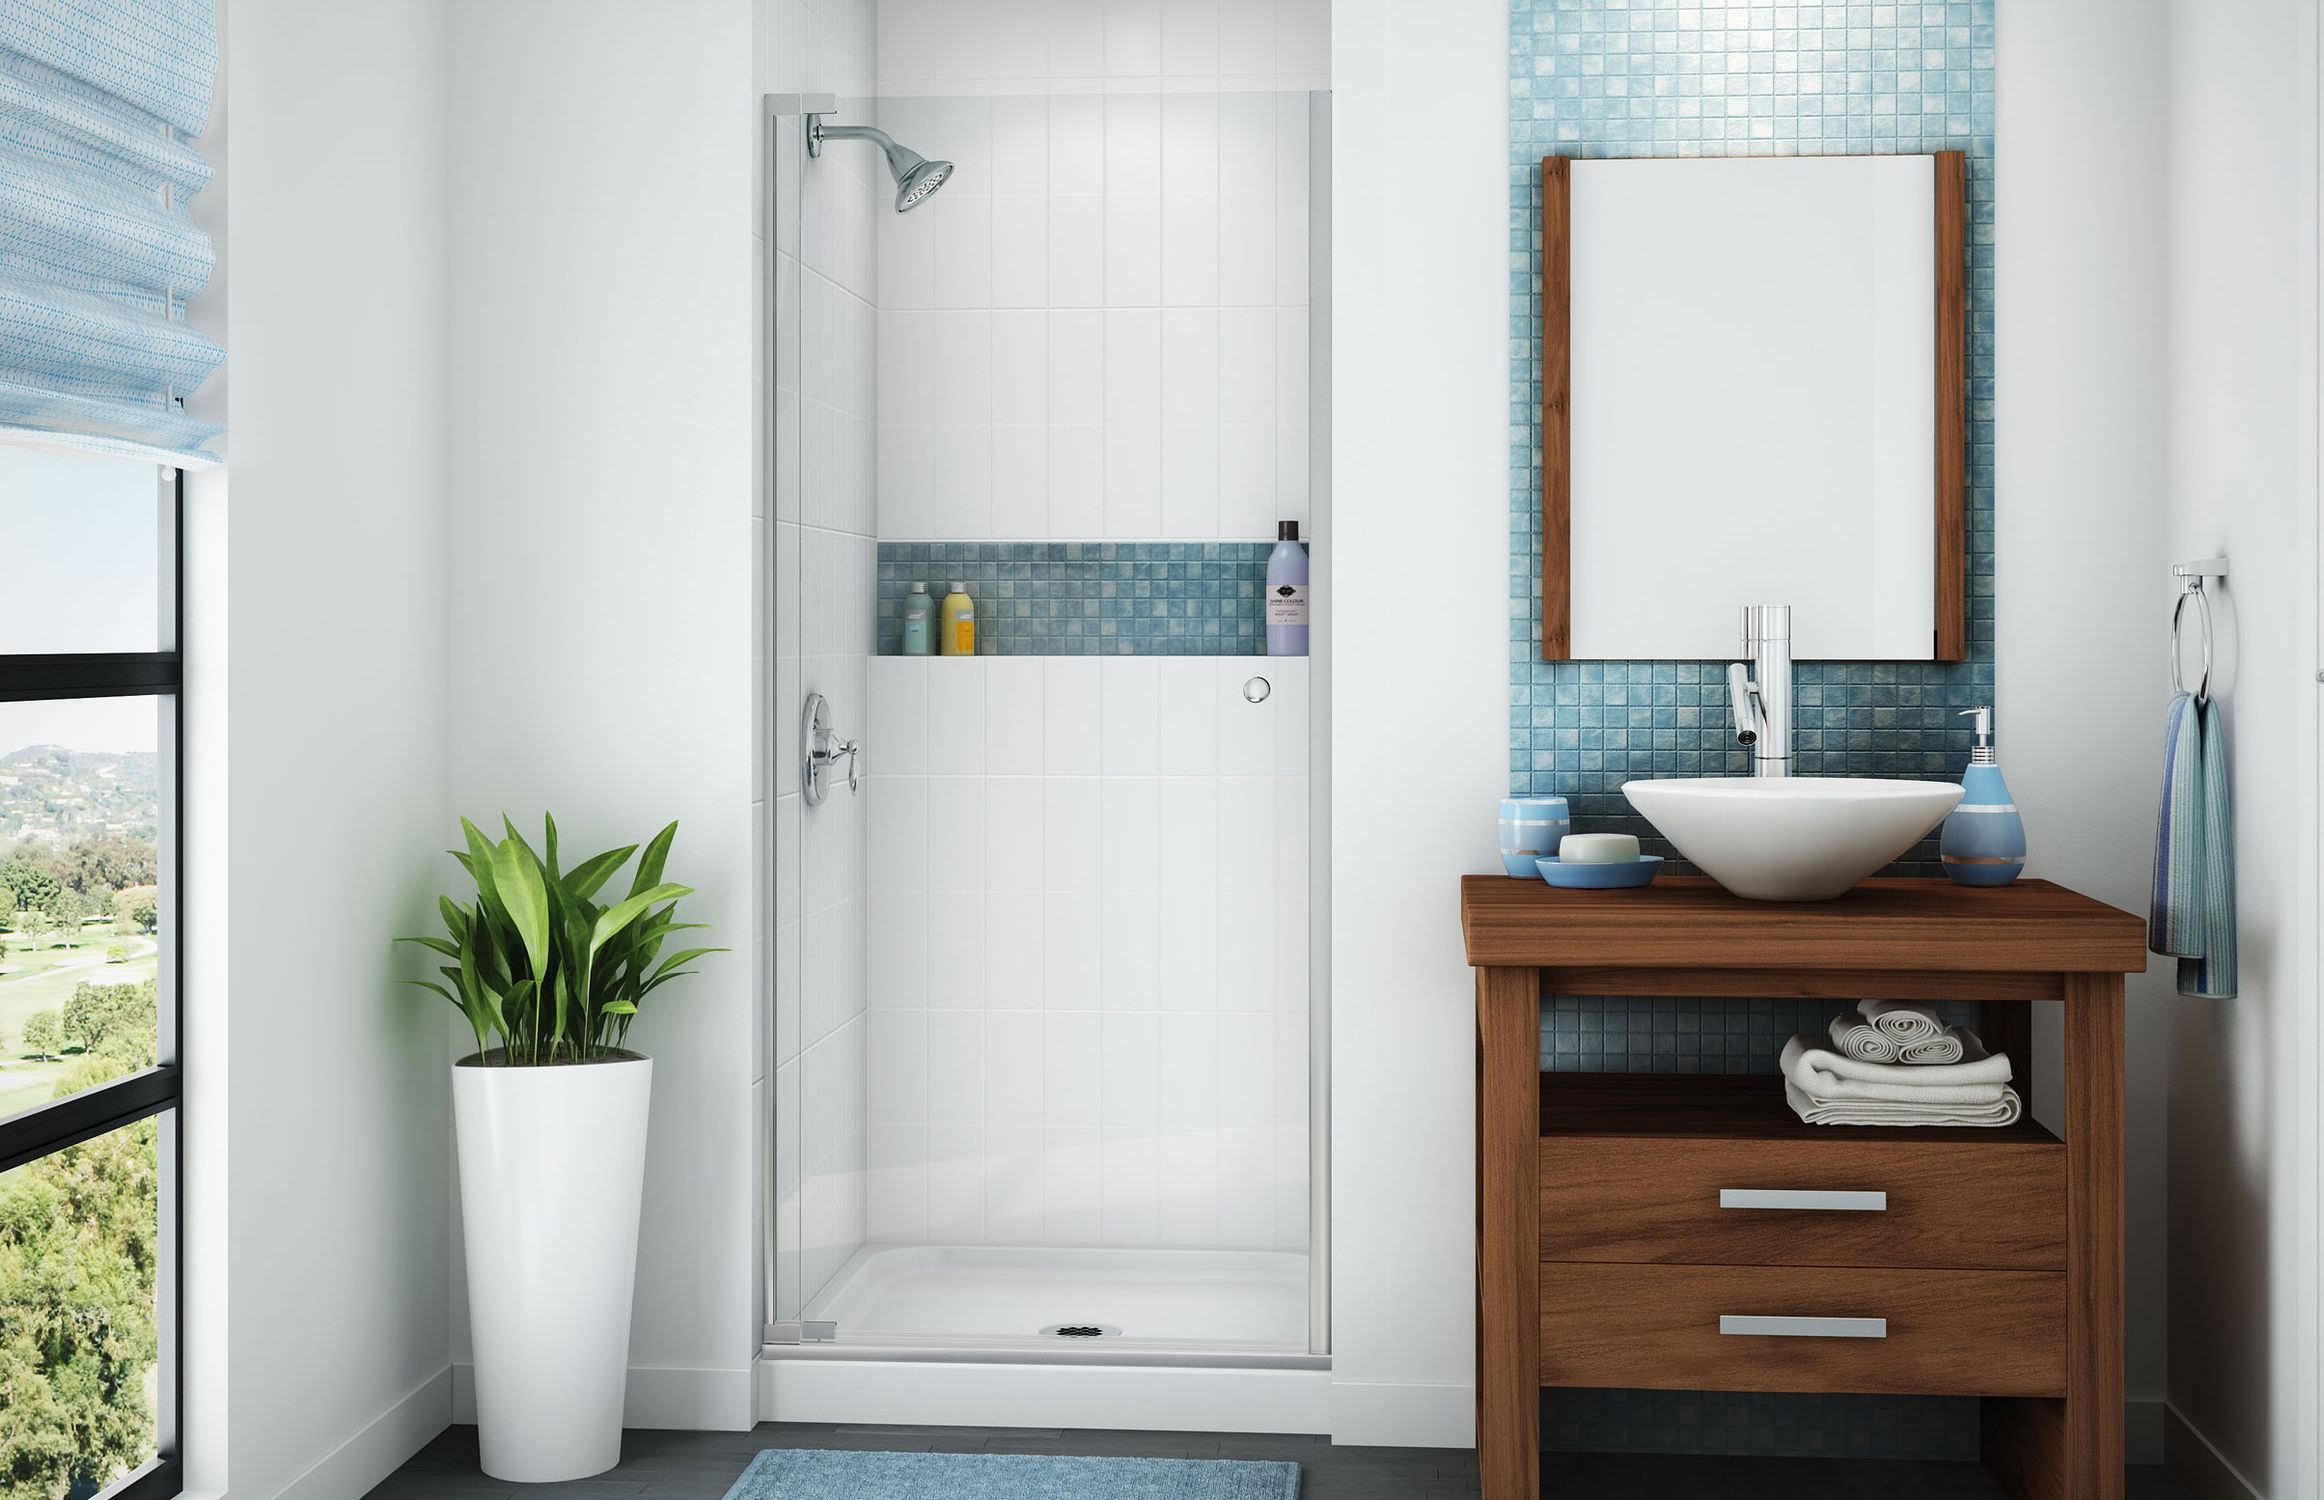 receveur de douche en fibre de verre